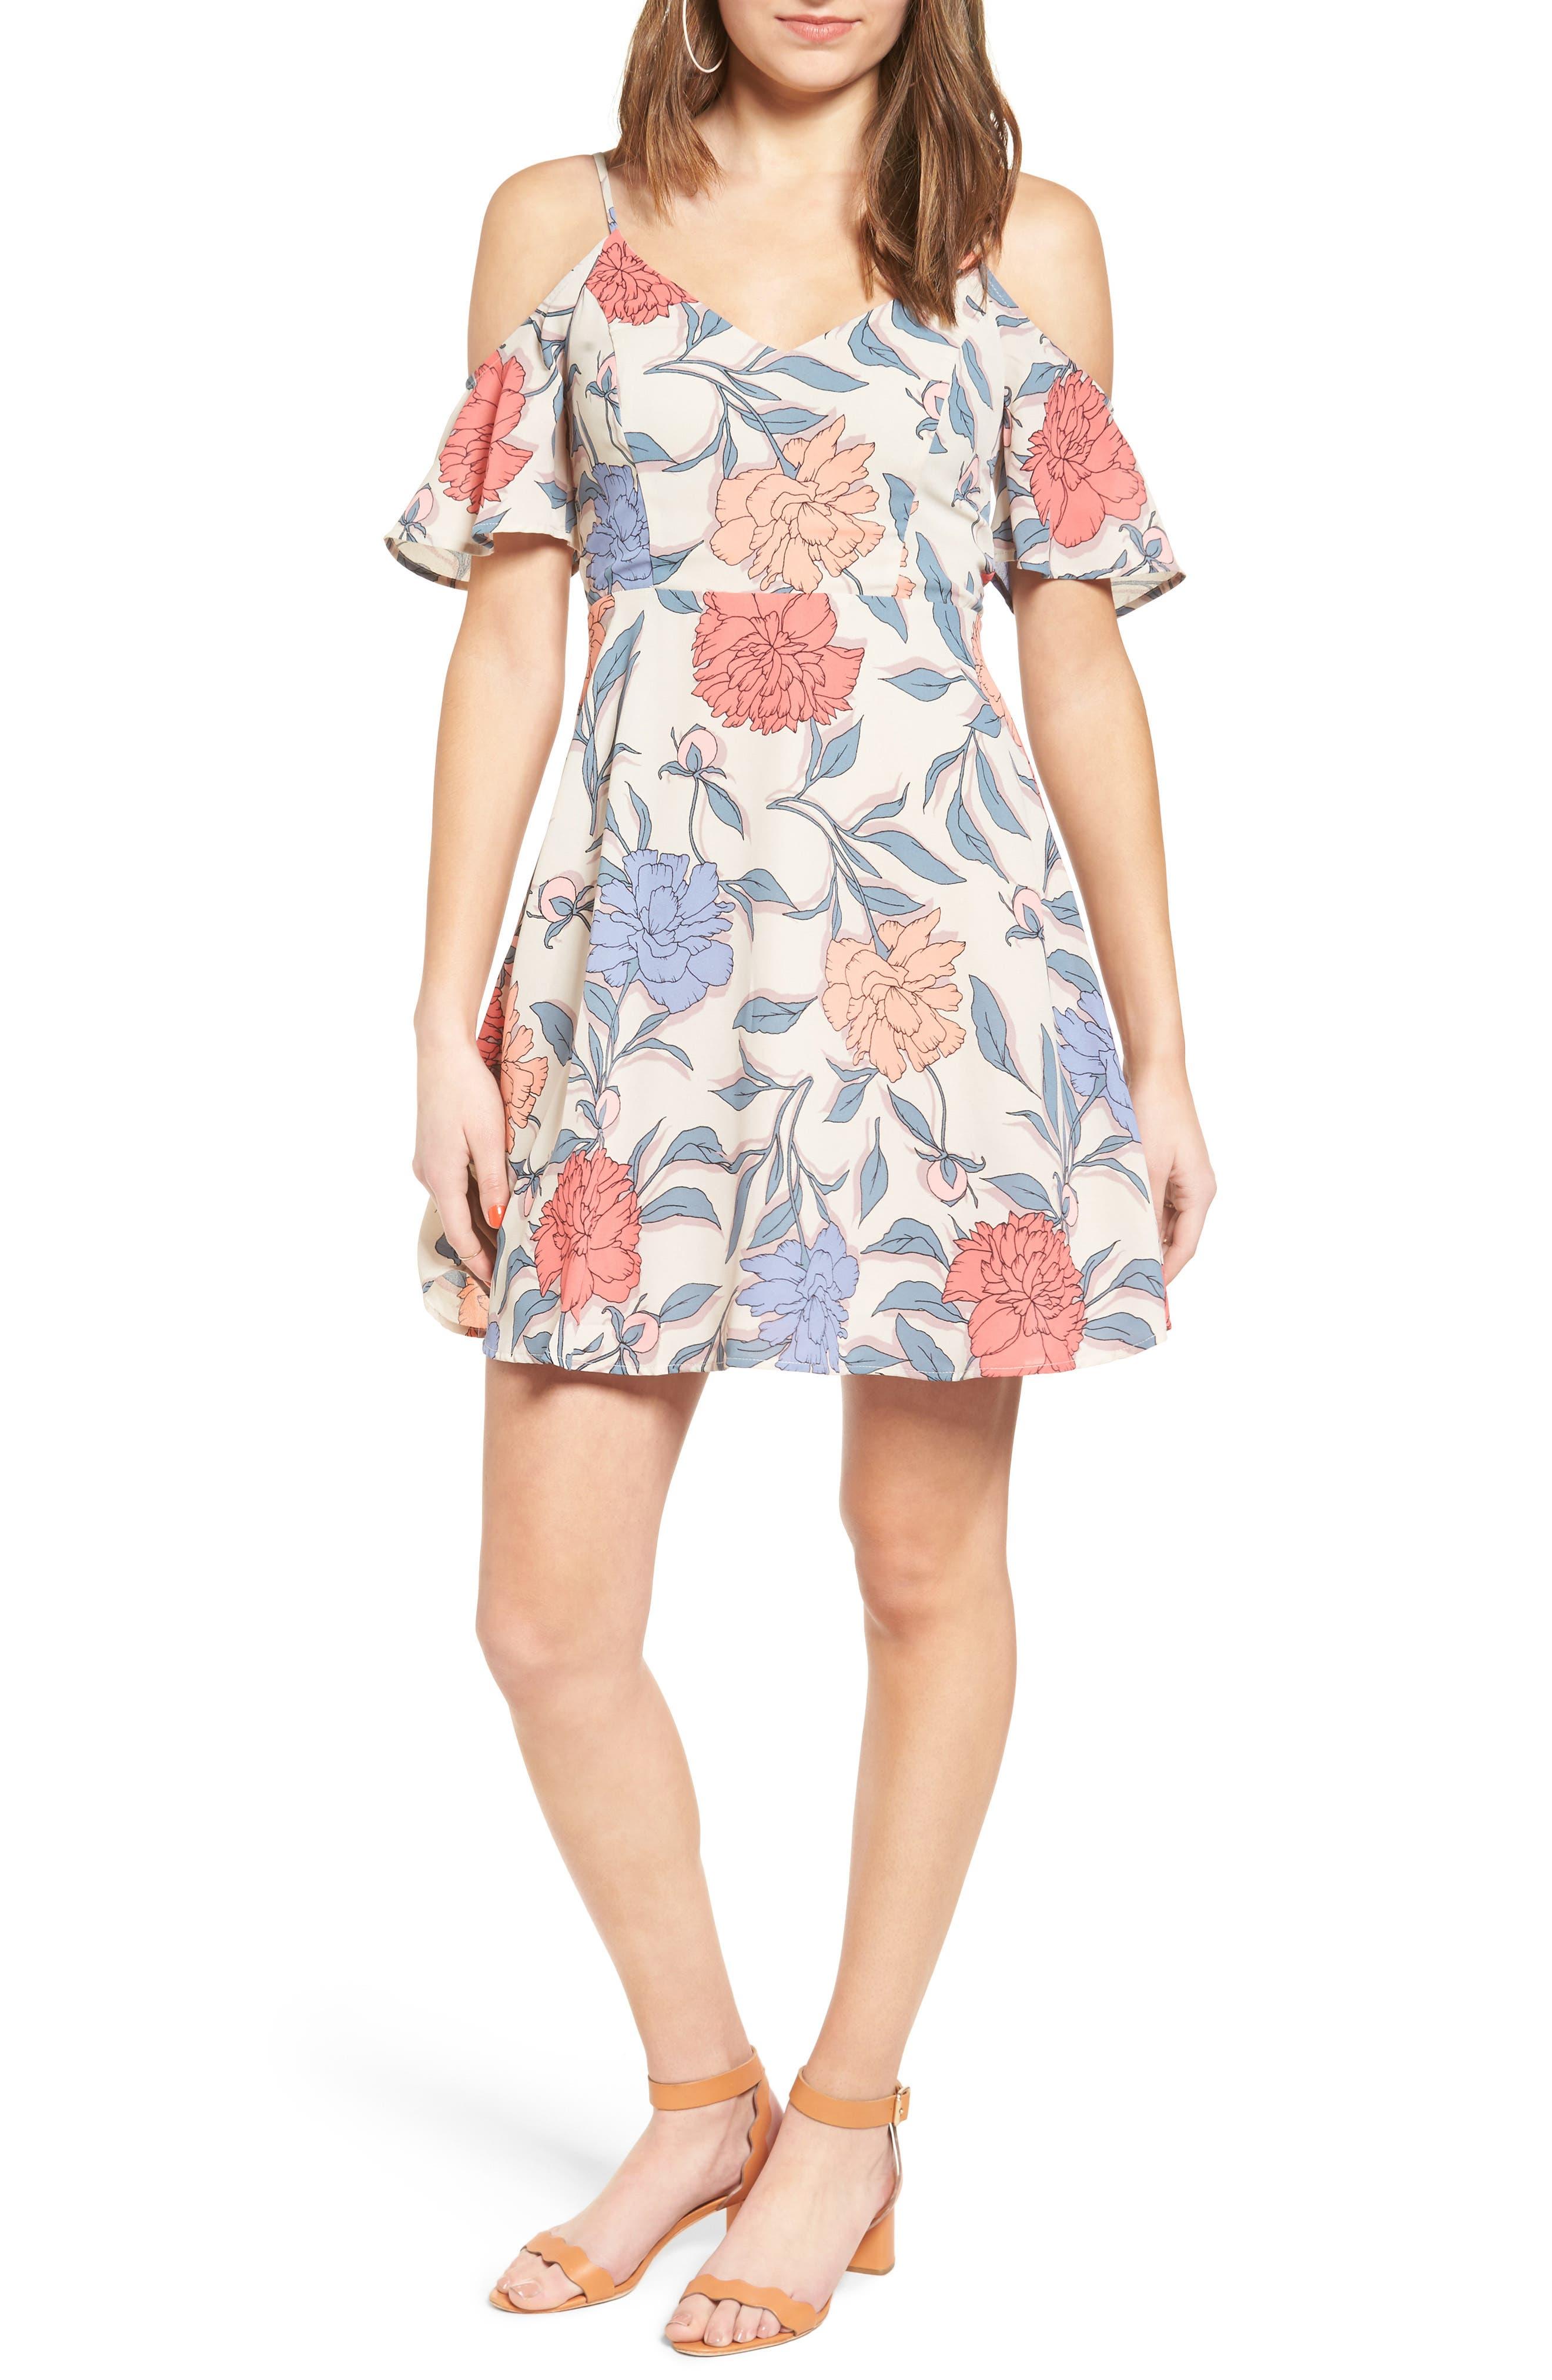 Alternate Image 1 Selected - Lush Off the Shoulder Fit & Flare Dress